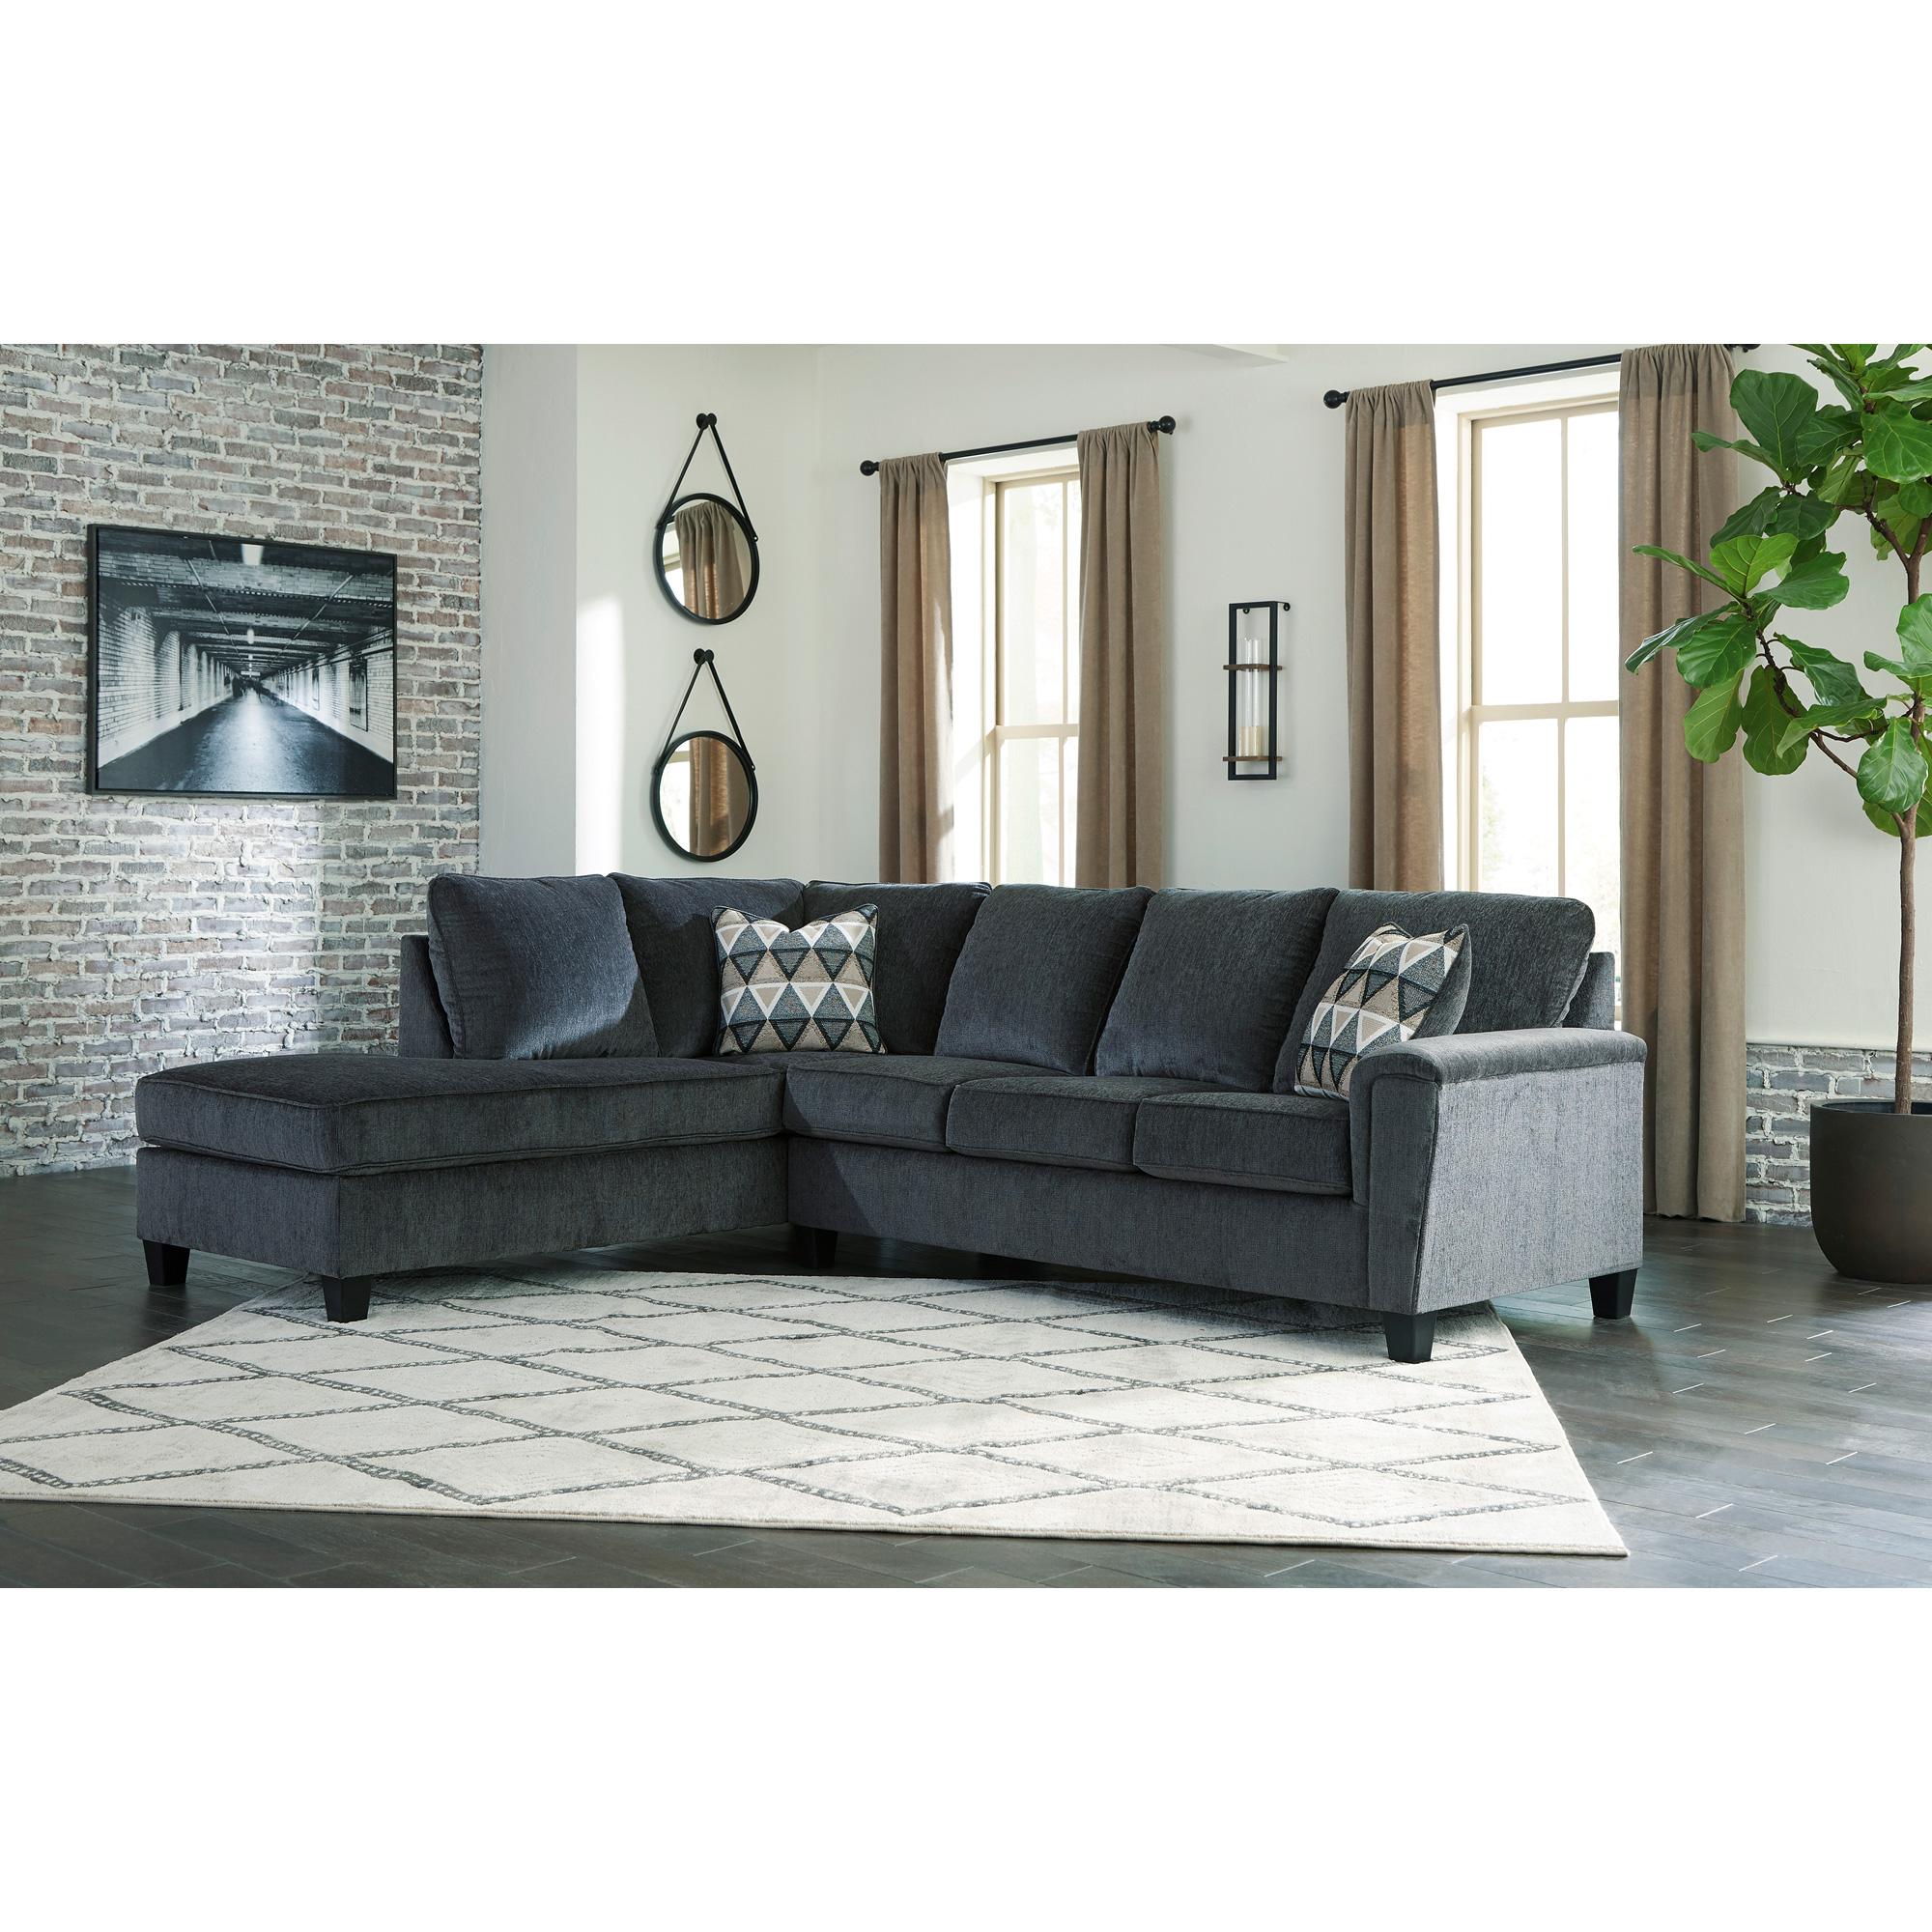 Ashley Furniture | Abinger Smoke Left Chaise Sectional Sofa